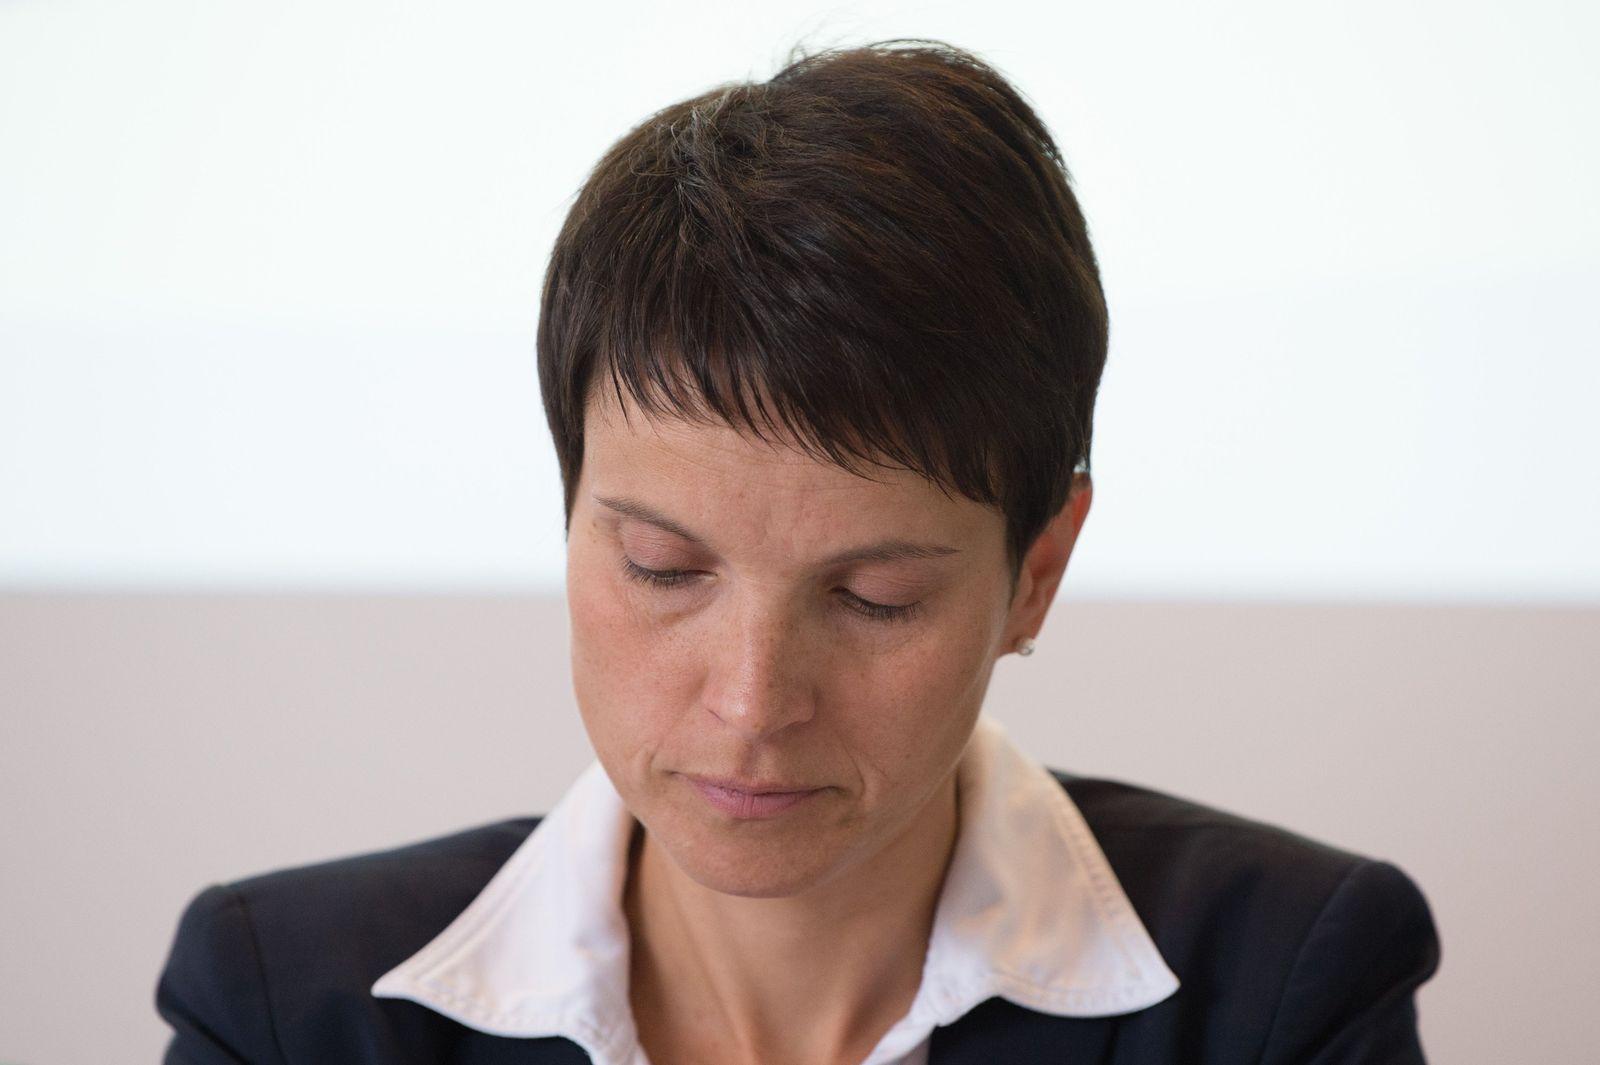 Frauke Petry/ Immunität